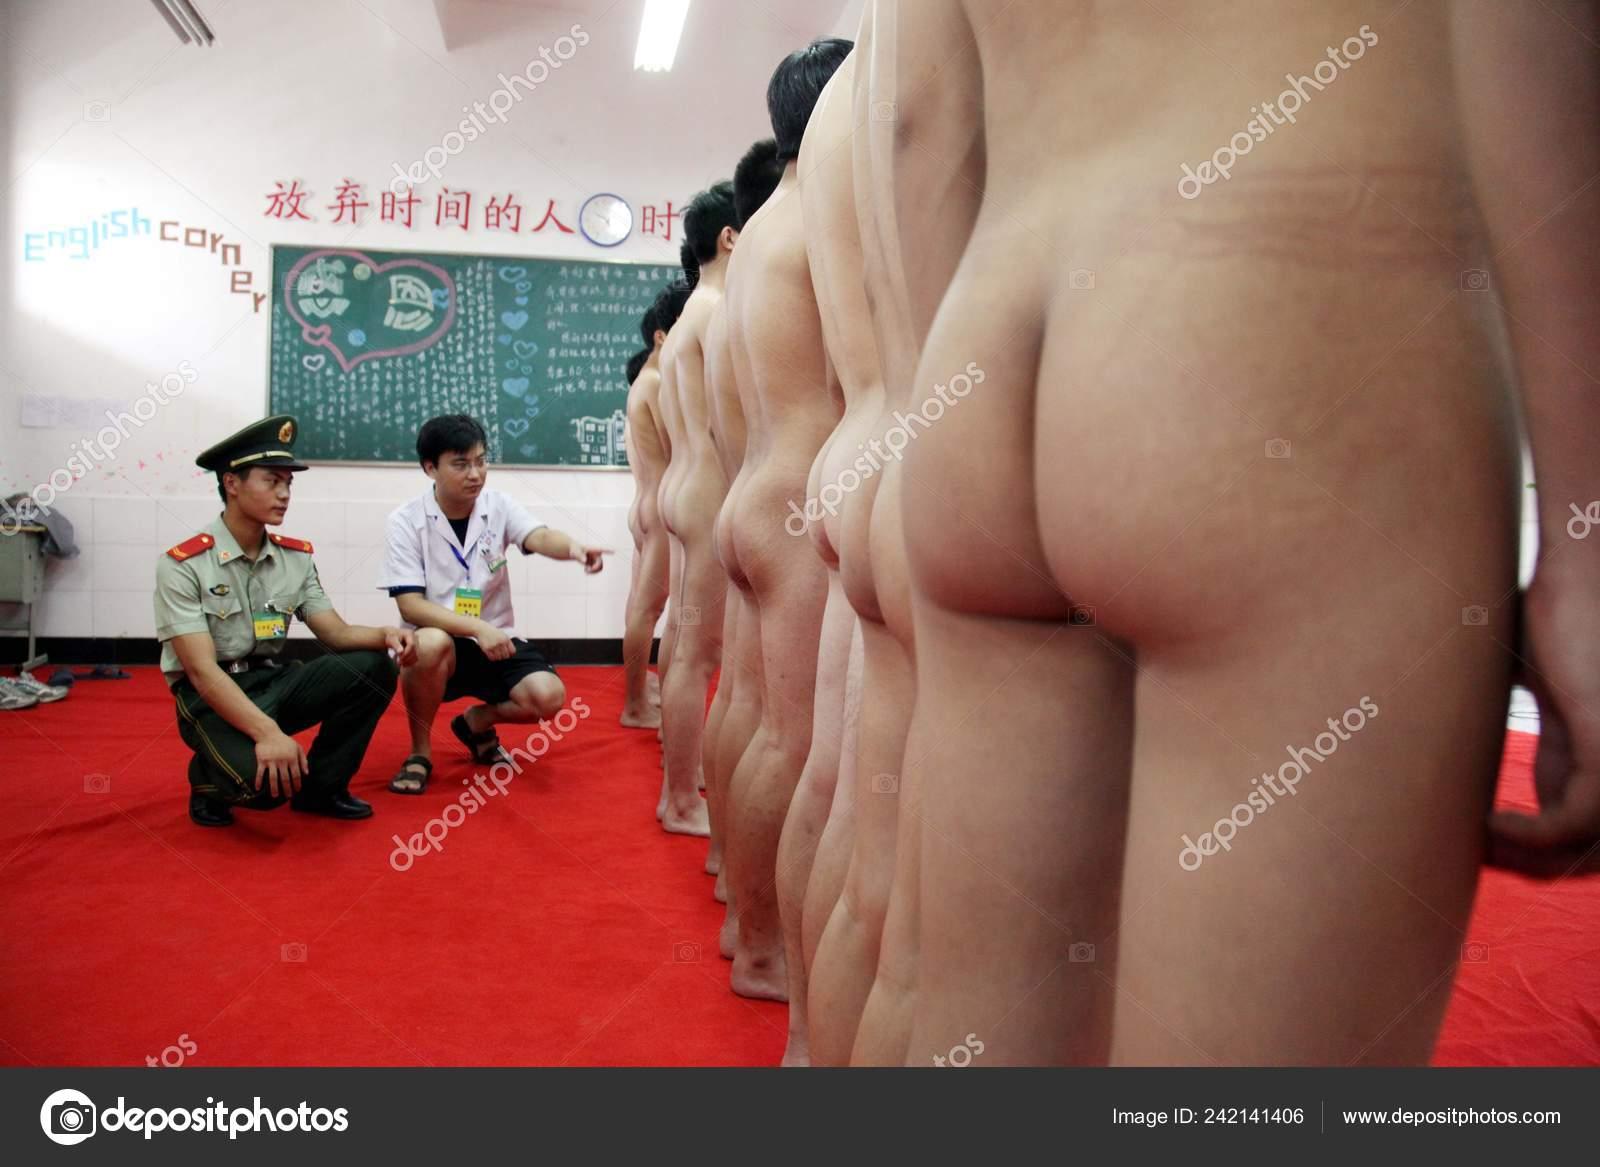 Erotic seual nudes